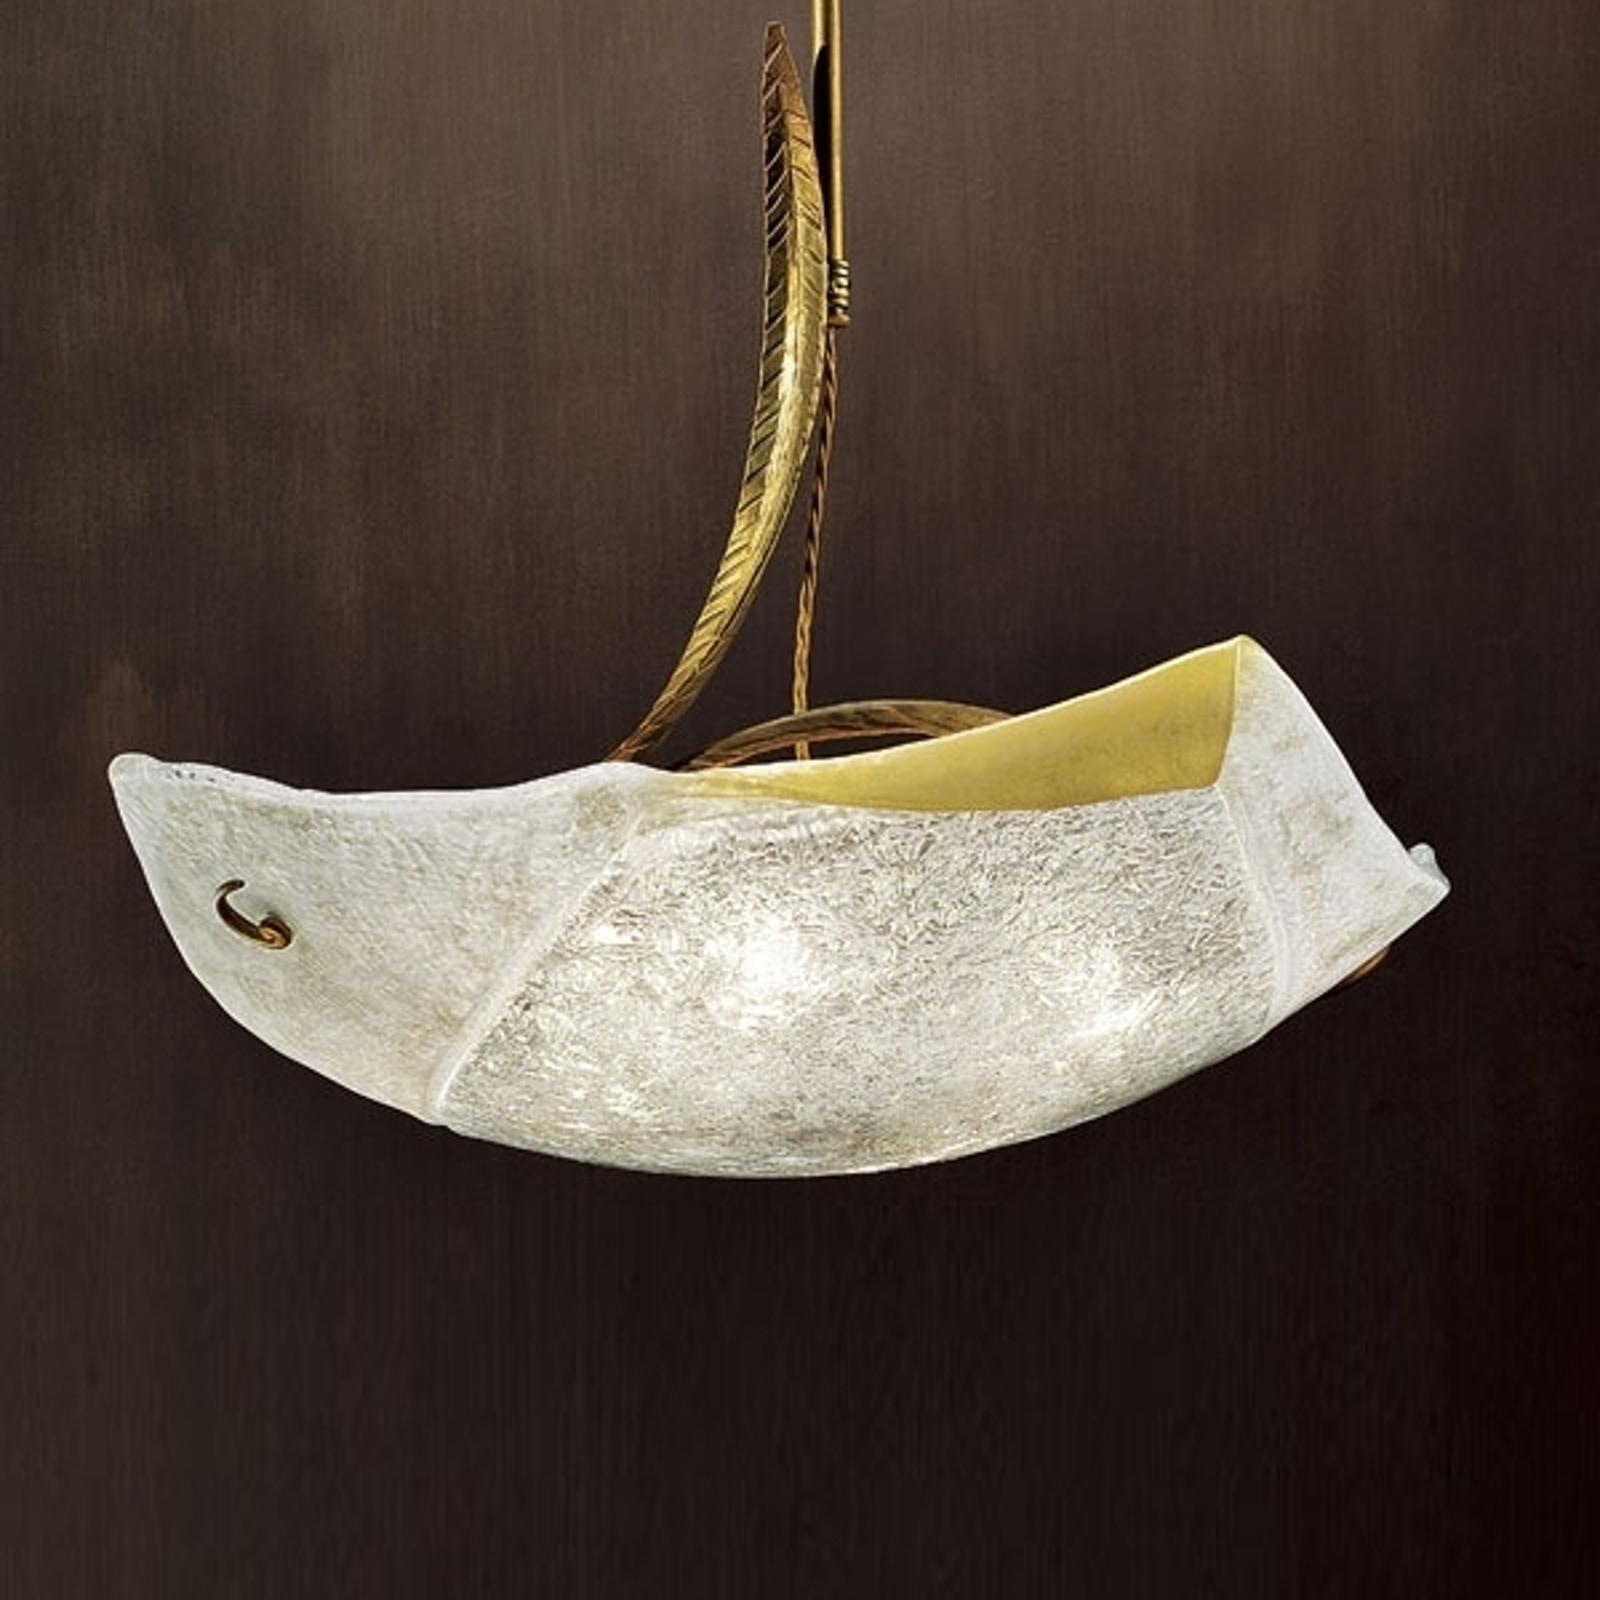 Designerska lampa wisząca ATENE